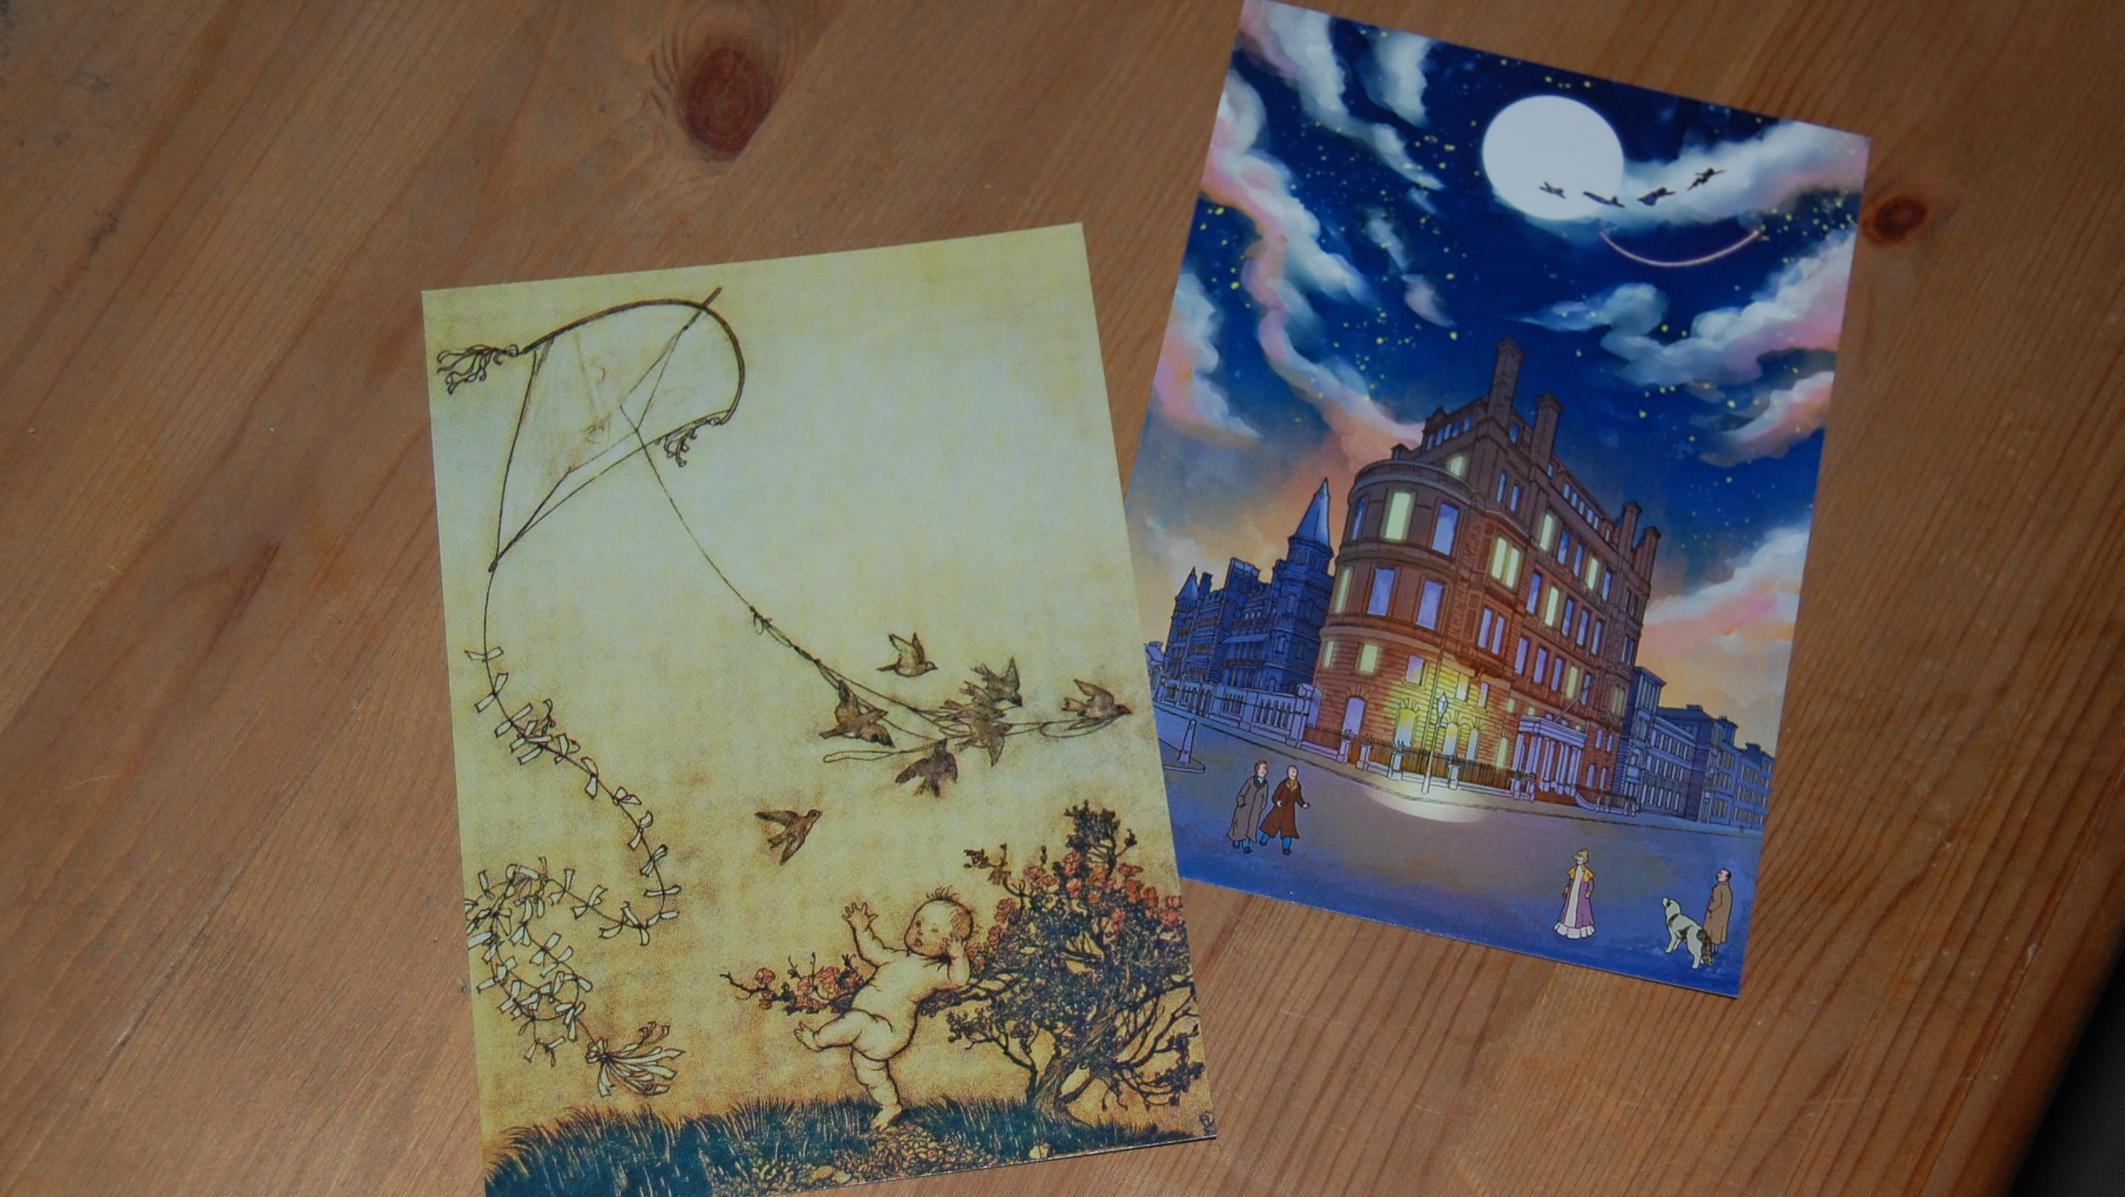 Peter Pan illustration on left by Arthur Rackham; illustration on right by Stref (Stephen White). Both postcards bought at exhibition.